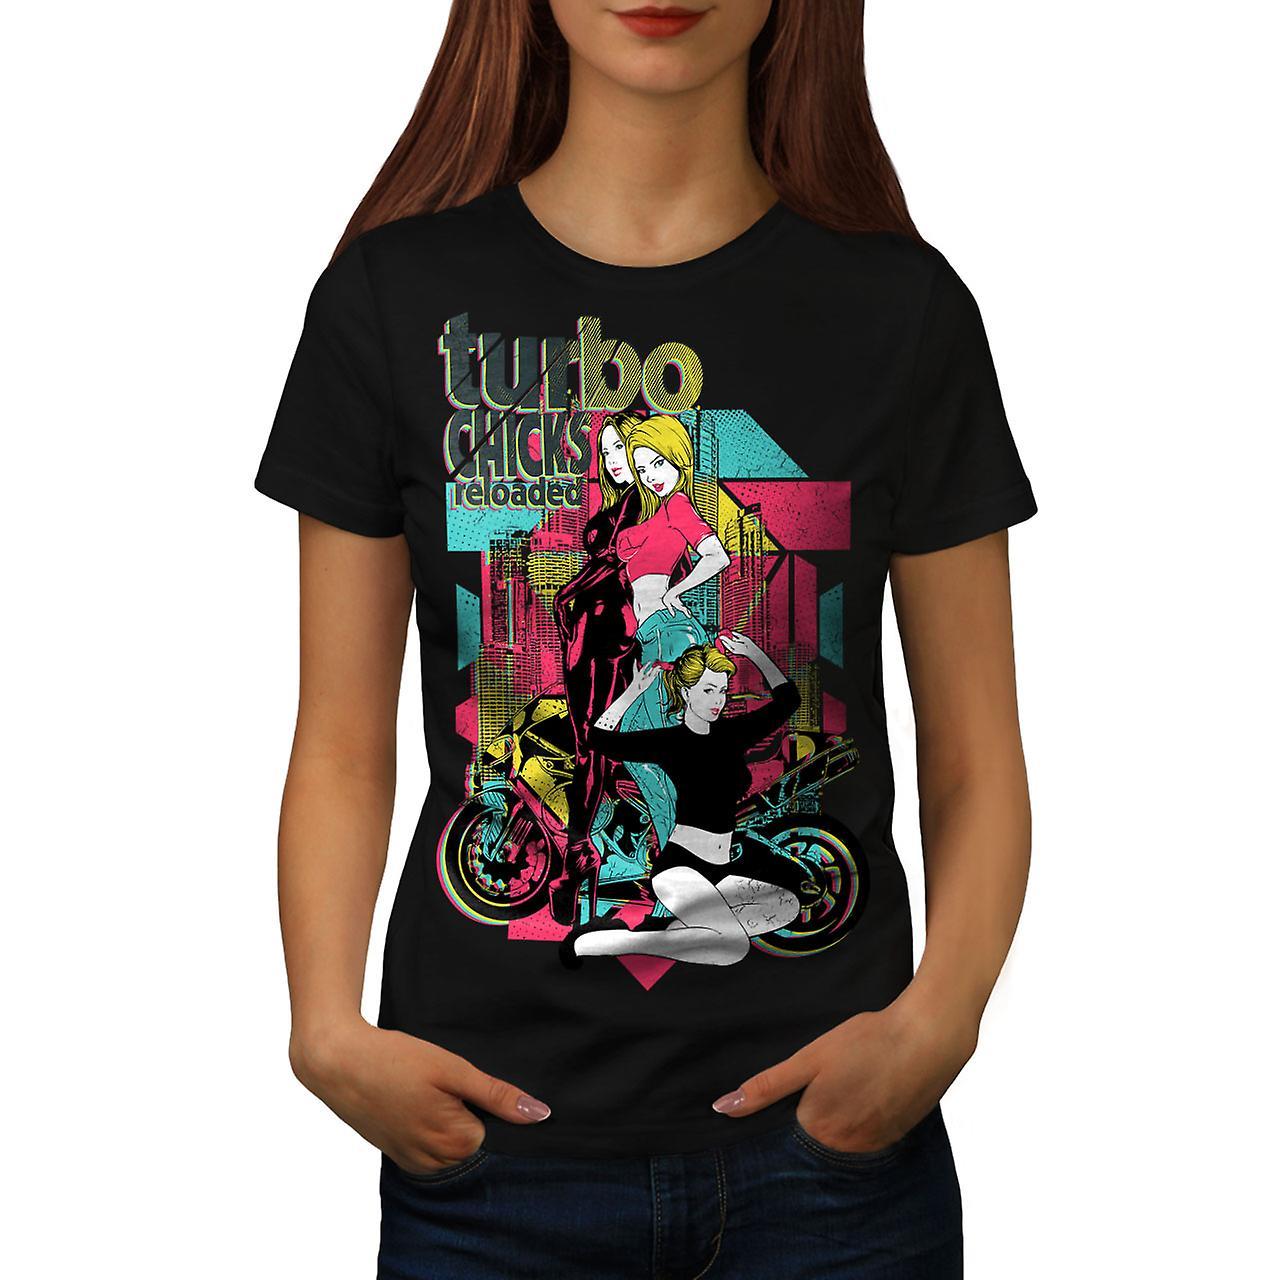 Turbo Chicks Cool Biker Women Black T-shirt | Wellcoda